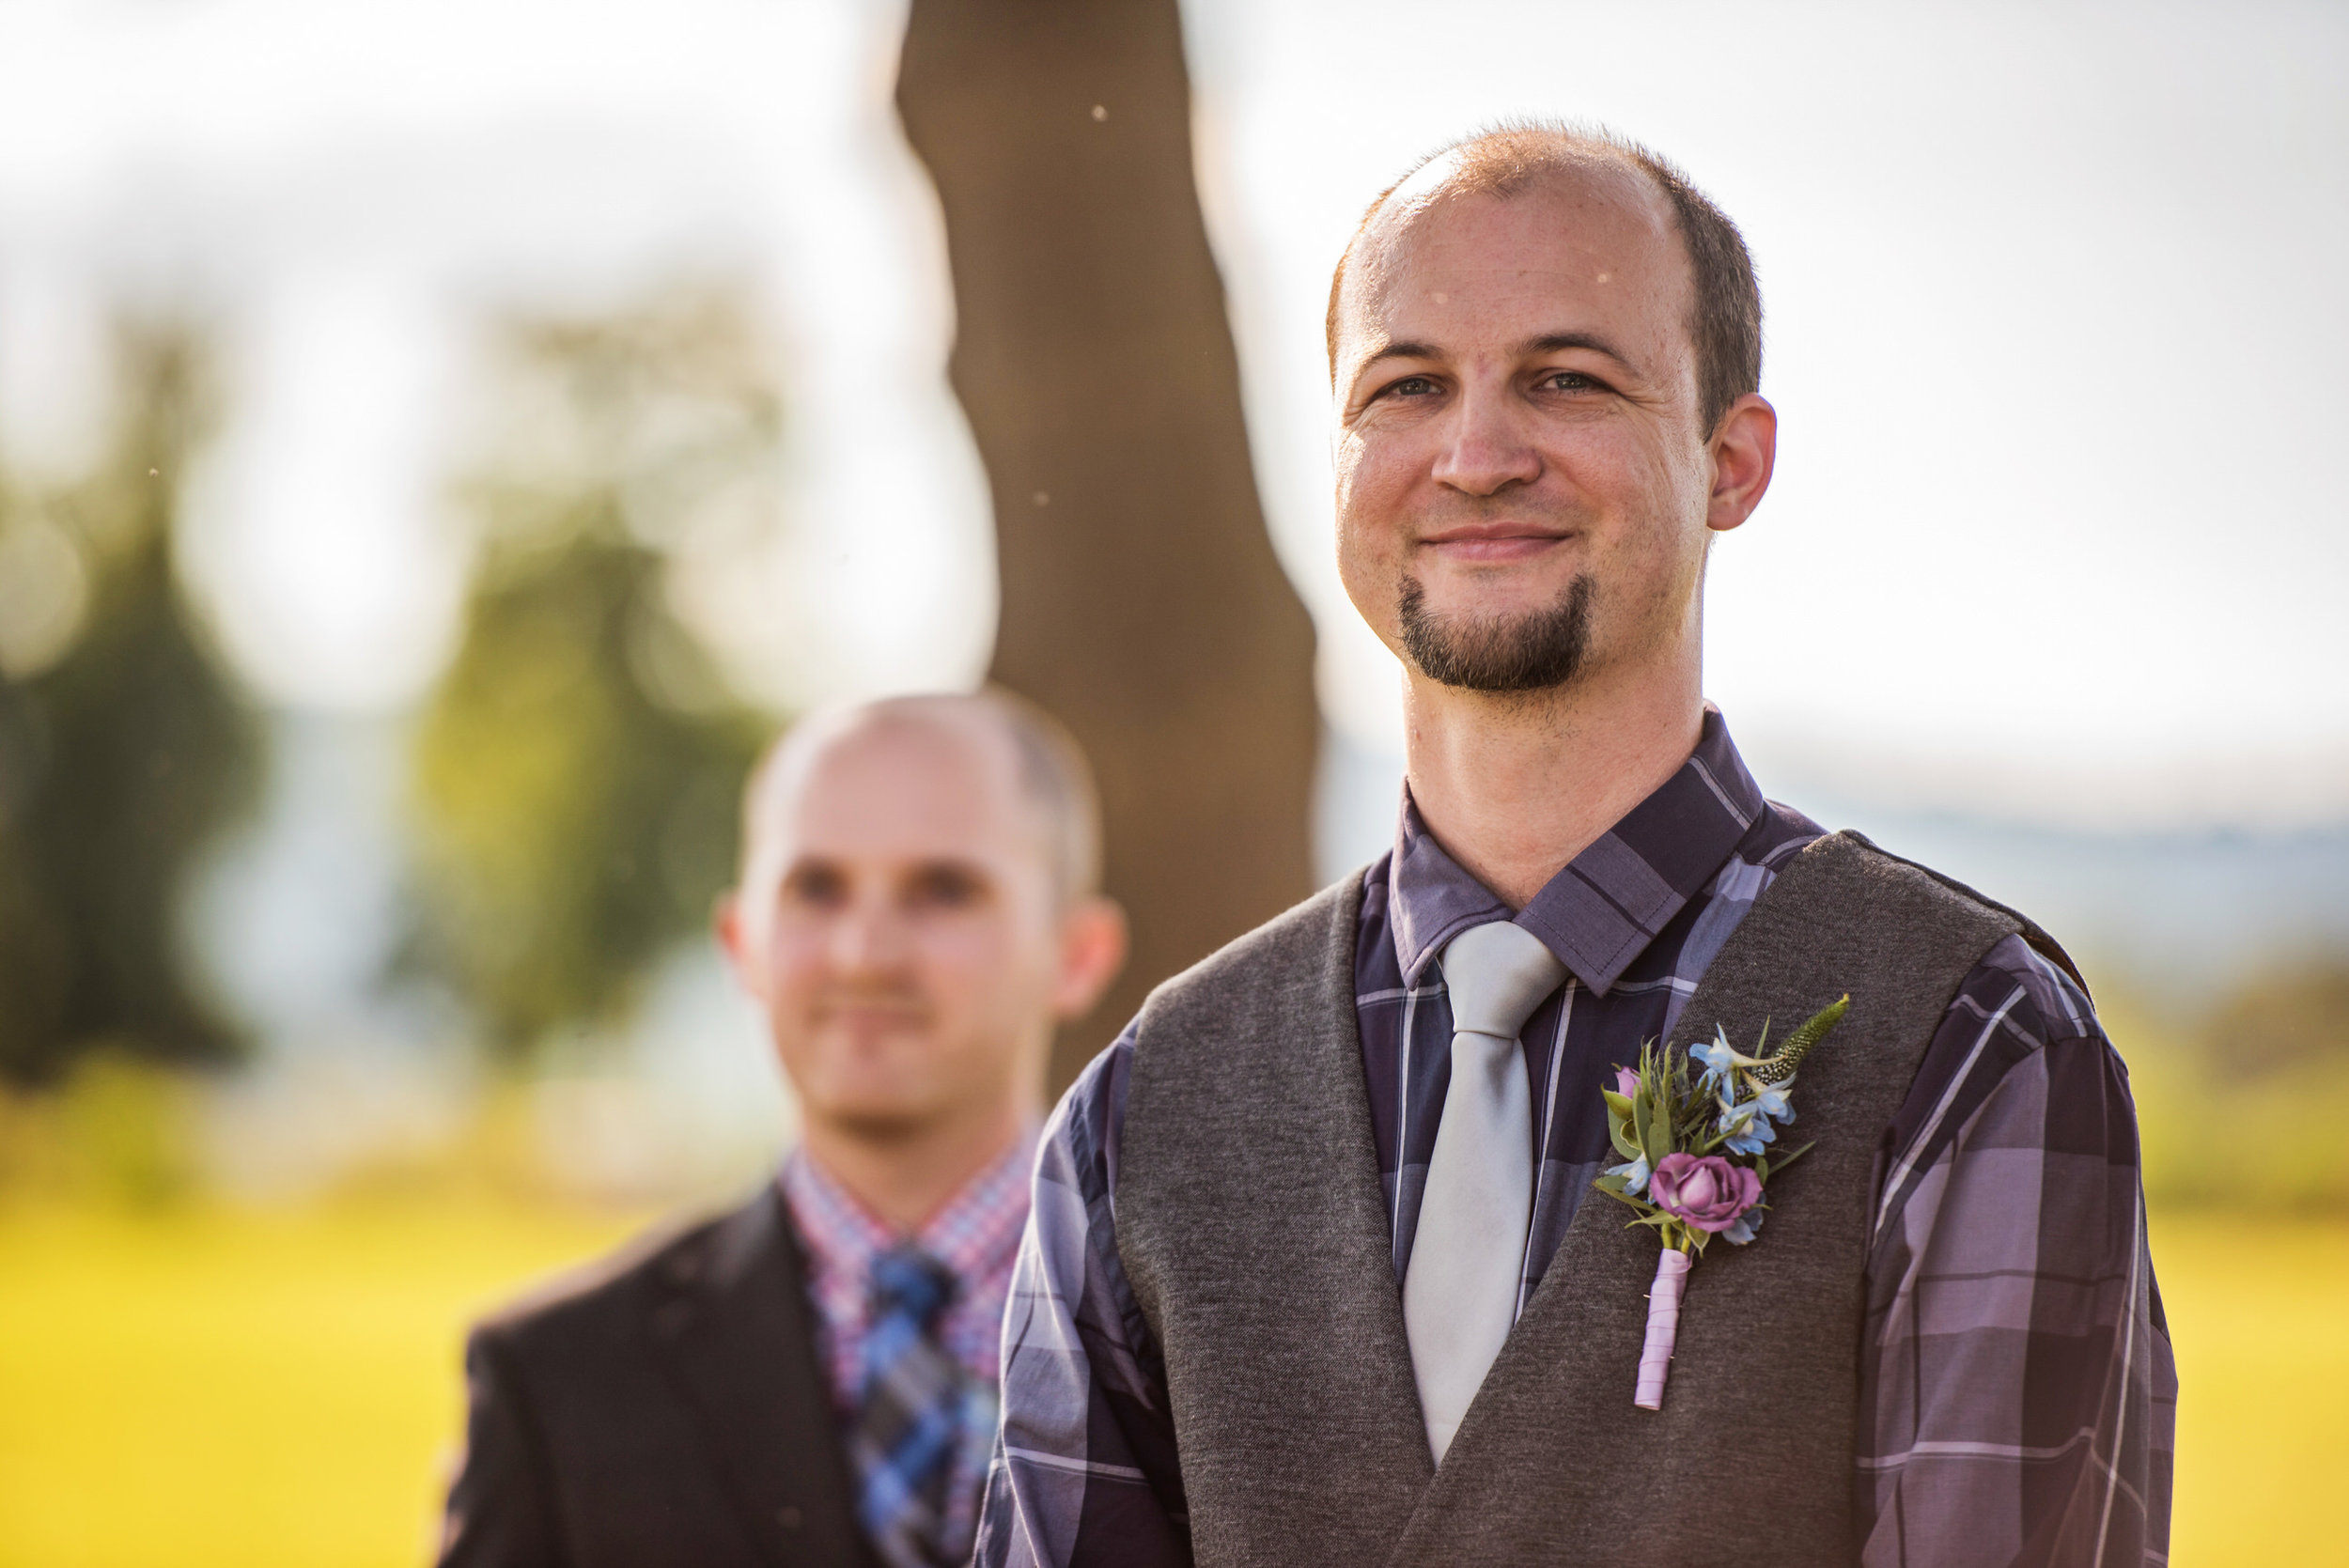 EastLynnFarmWedding-Steph&Aaron-Ceremony-51.jpg